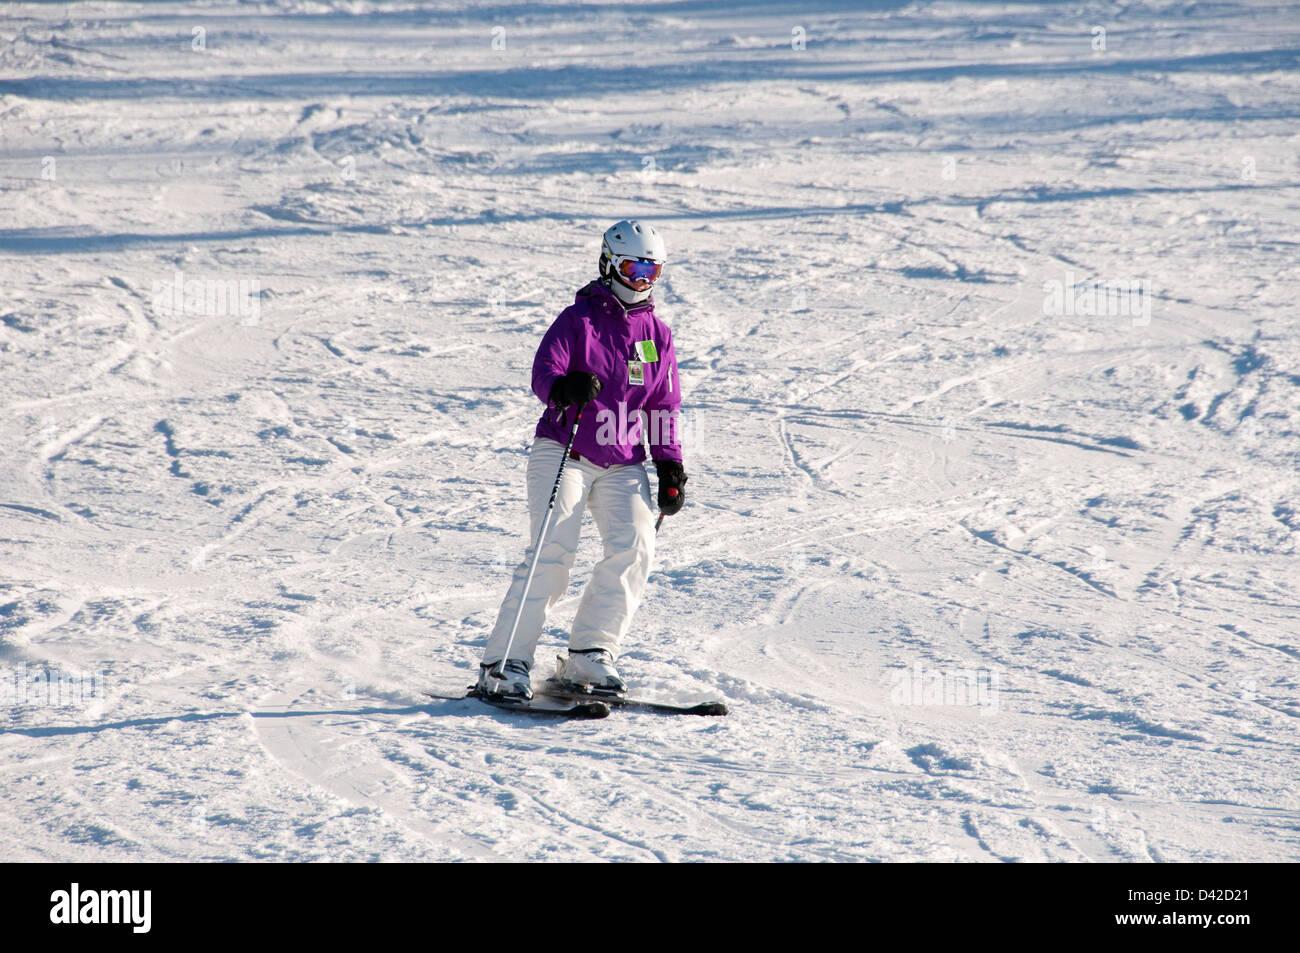 Skier Mont Saint Bruno Quebec Canada - Stock Image